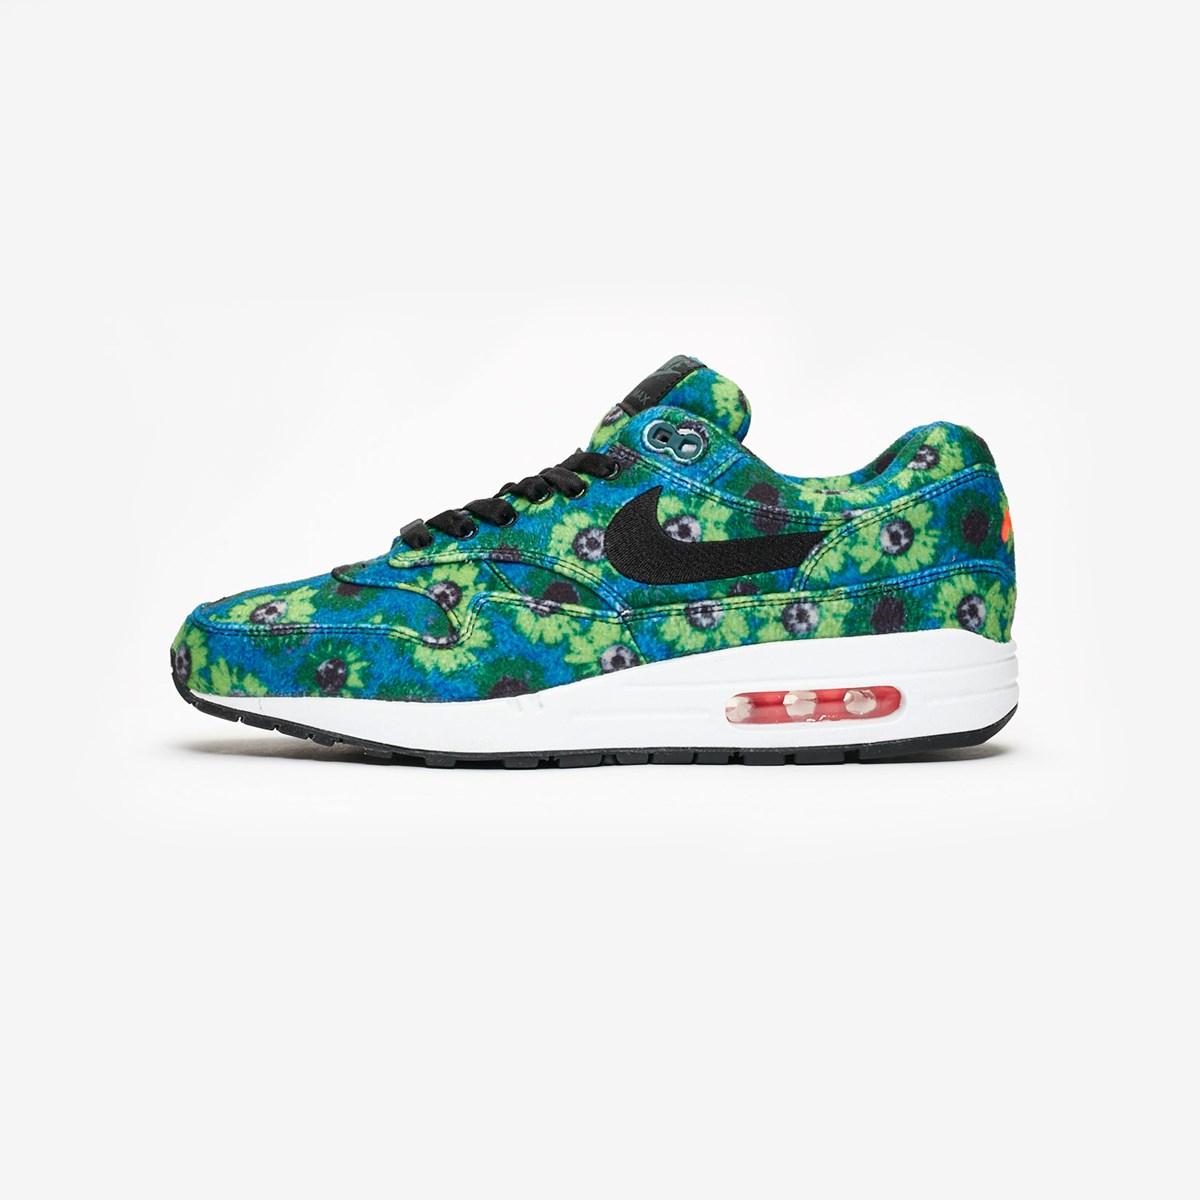 best sneakers e0d76 b4e30 Nike Air Max 1 Premium SE - 858876-002 - Sneakersnstuff I Sneakers    Streetwear online seit 1999